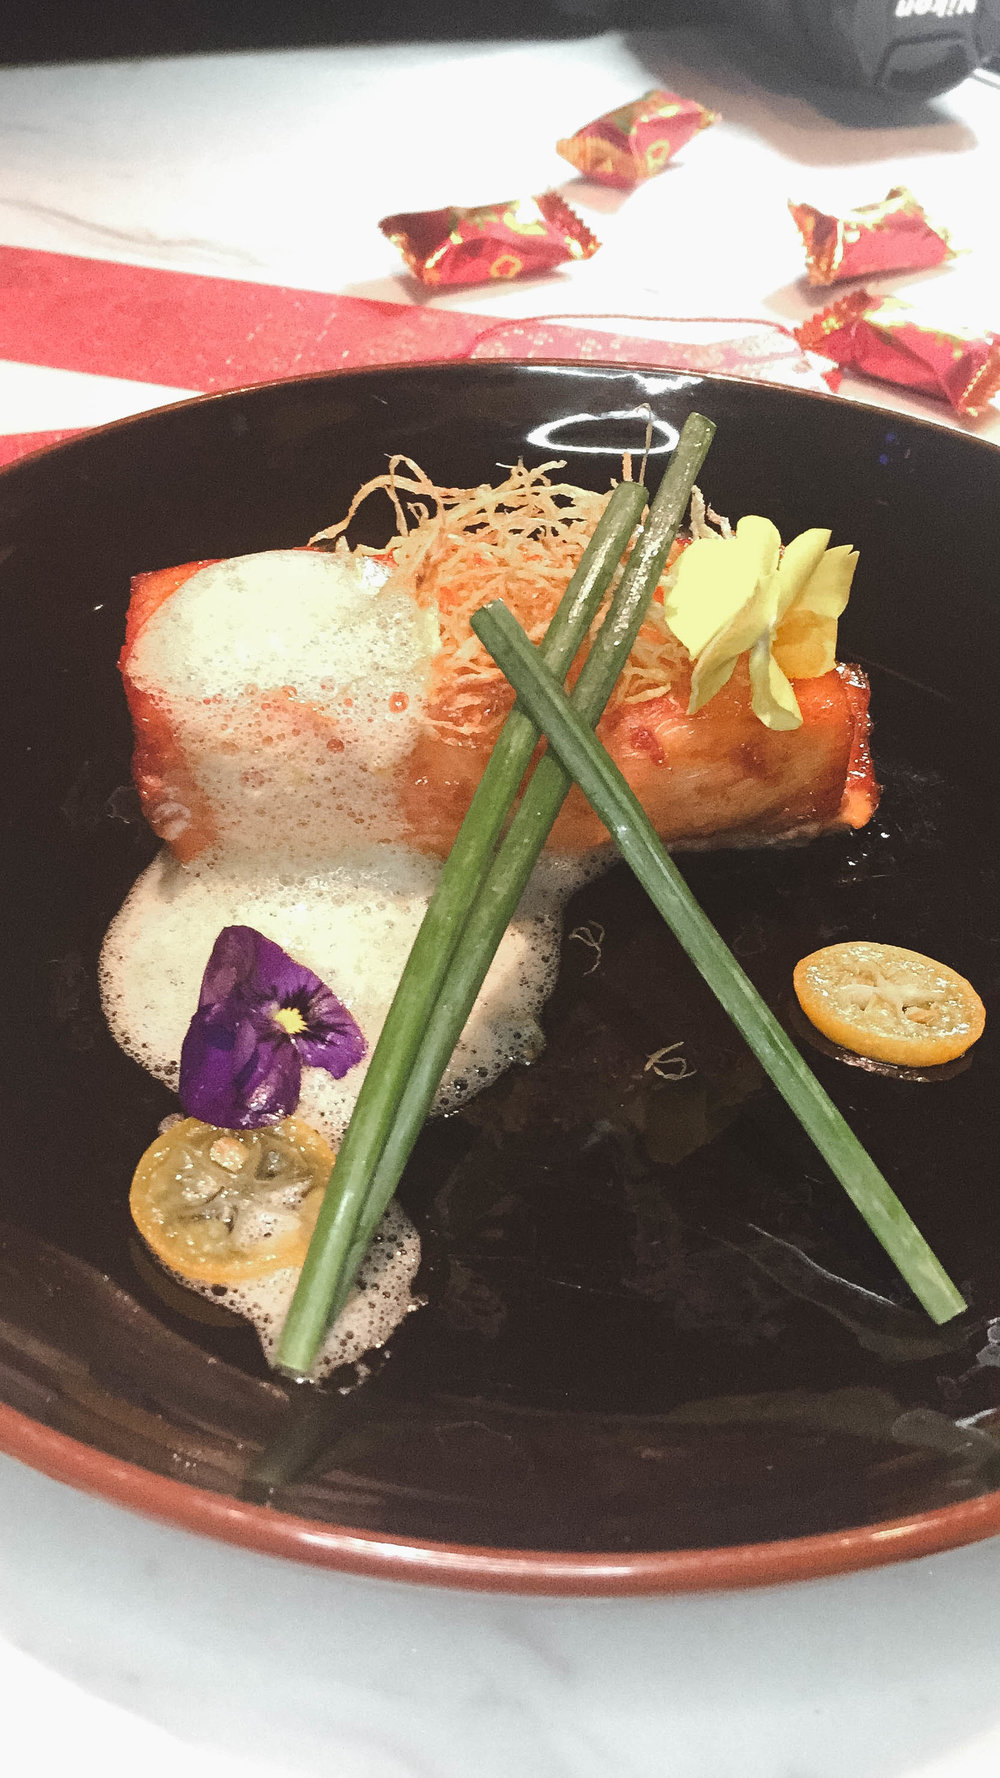 Baked Chilean sea bass with Kumquat glaze